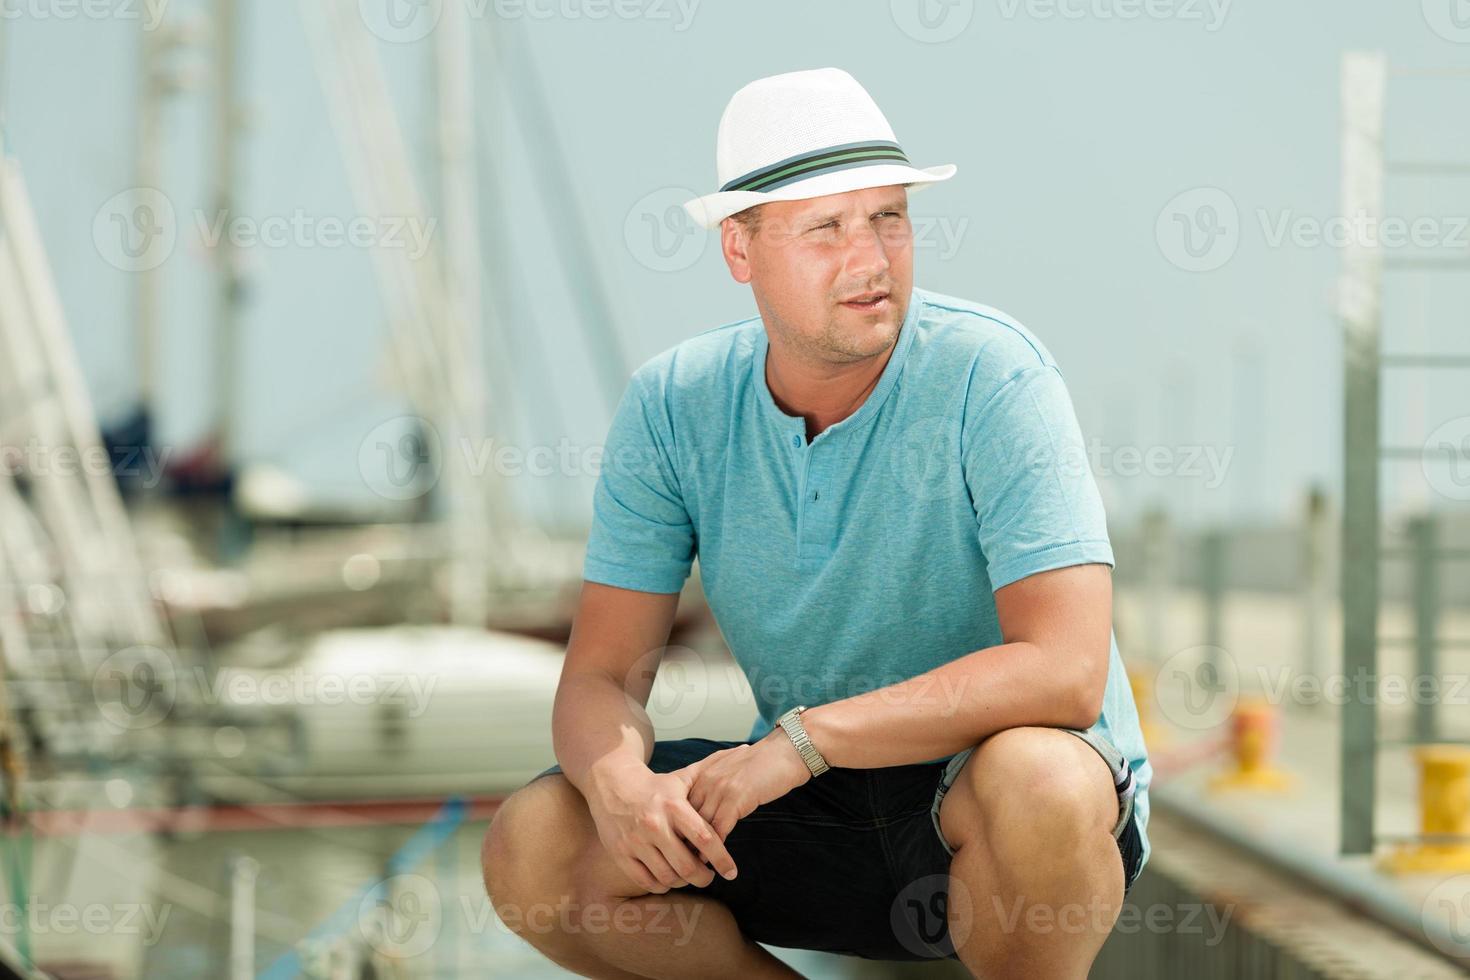 mode portret van knappe man op pier tegen jachten foto